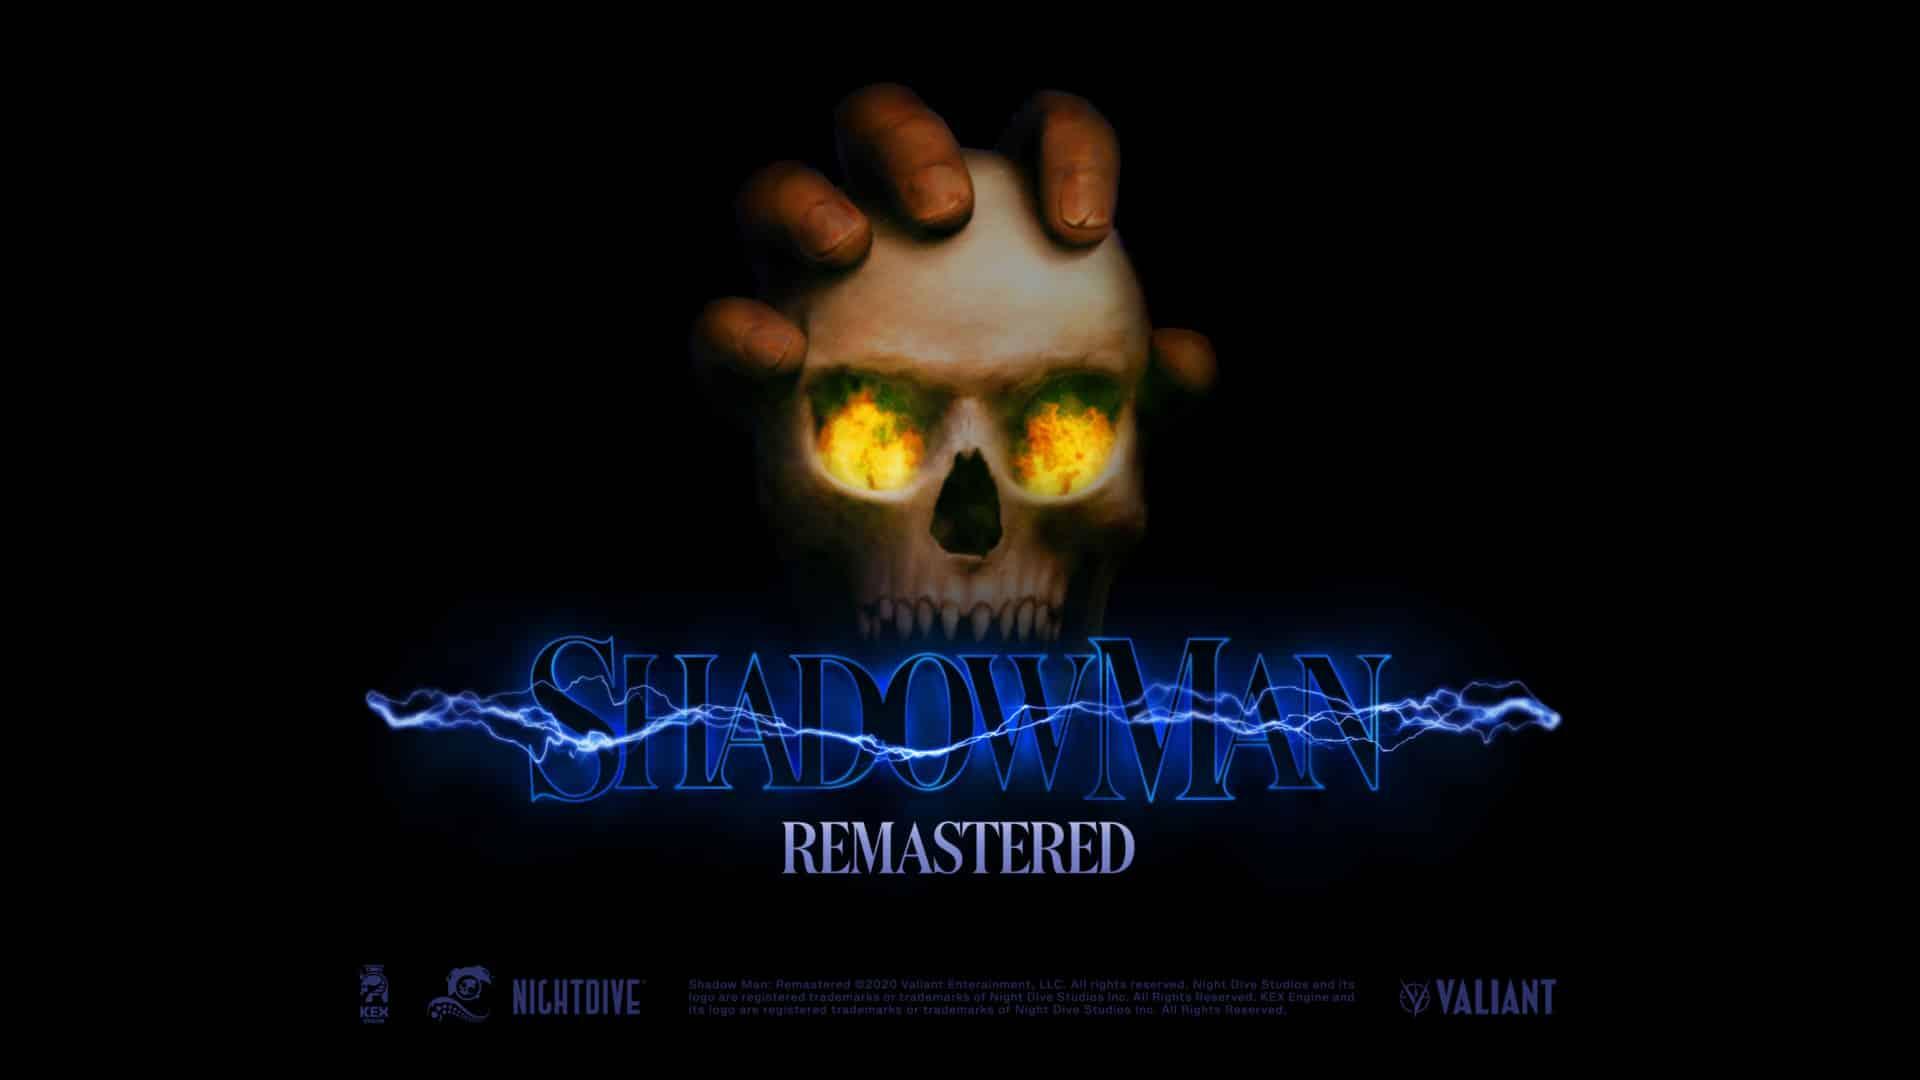 Shadow Man Remastered Valiant Entertainment Nightdive Studios Acclaim Studios